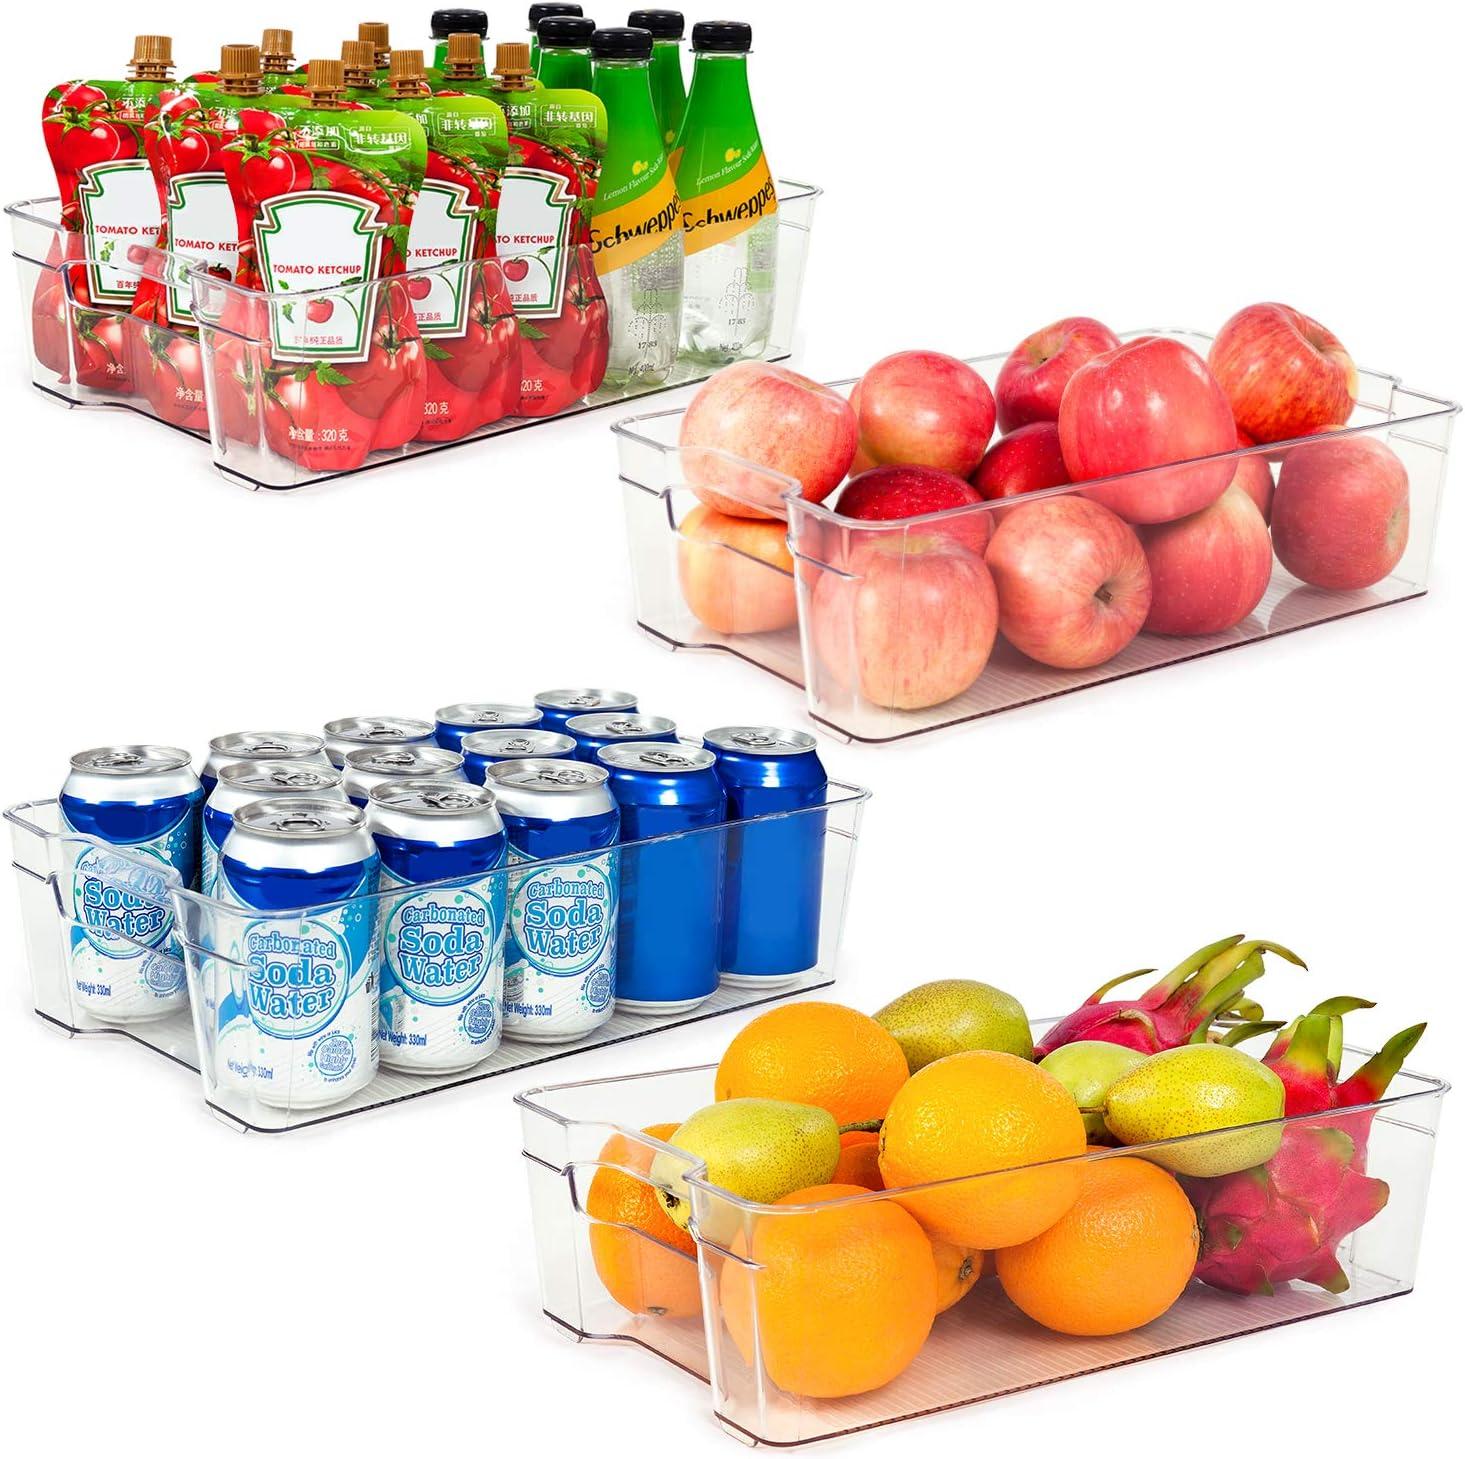 "Refrigerator Organizer Bins, Vtopmart 4 Pack Large Clear Plastic Food Storage Bin with Handle for Freezer, Cabinet, Fridge, Kitchen Pantry Organization and Storage, BPA Free, 14.5"" Long"